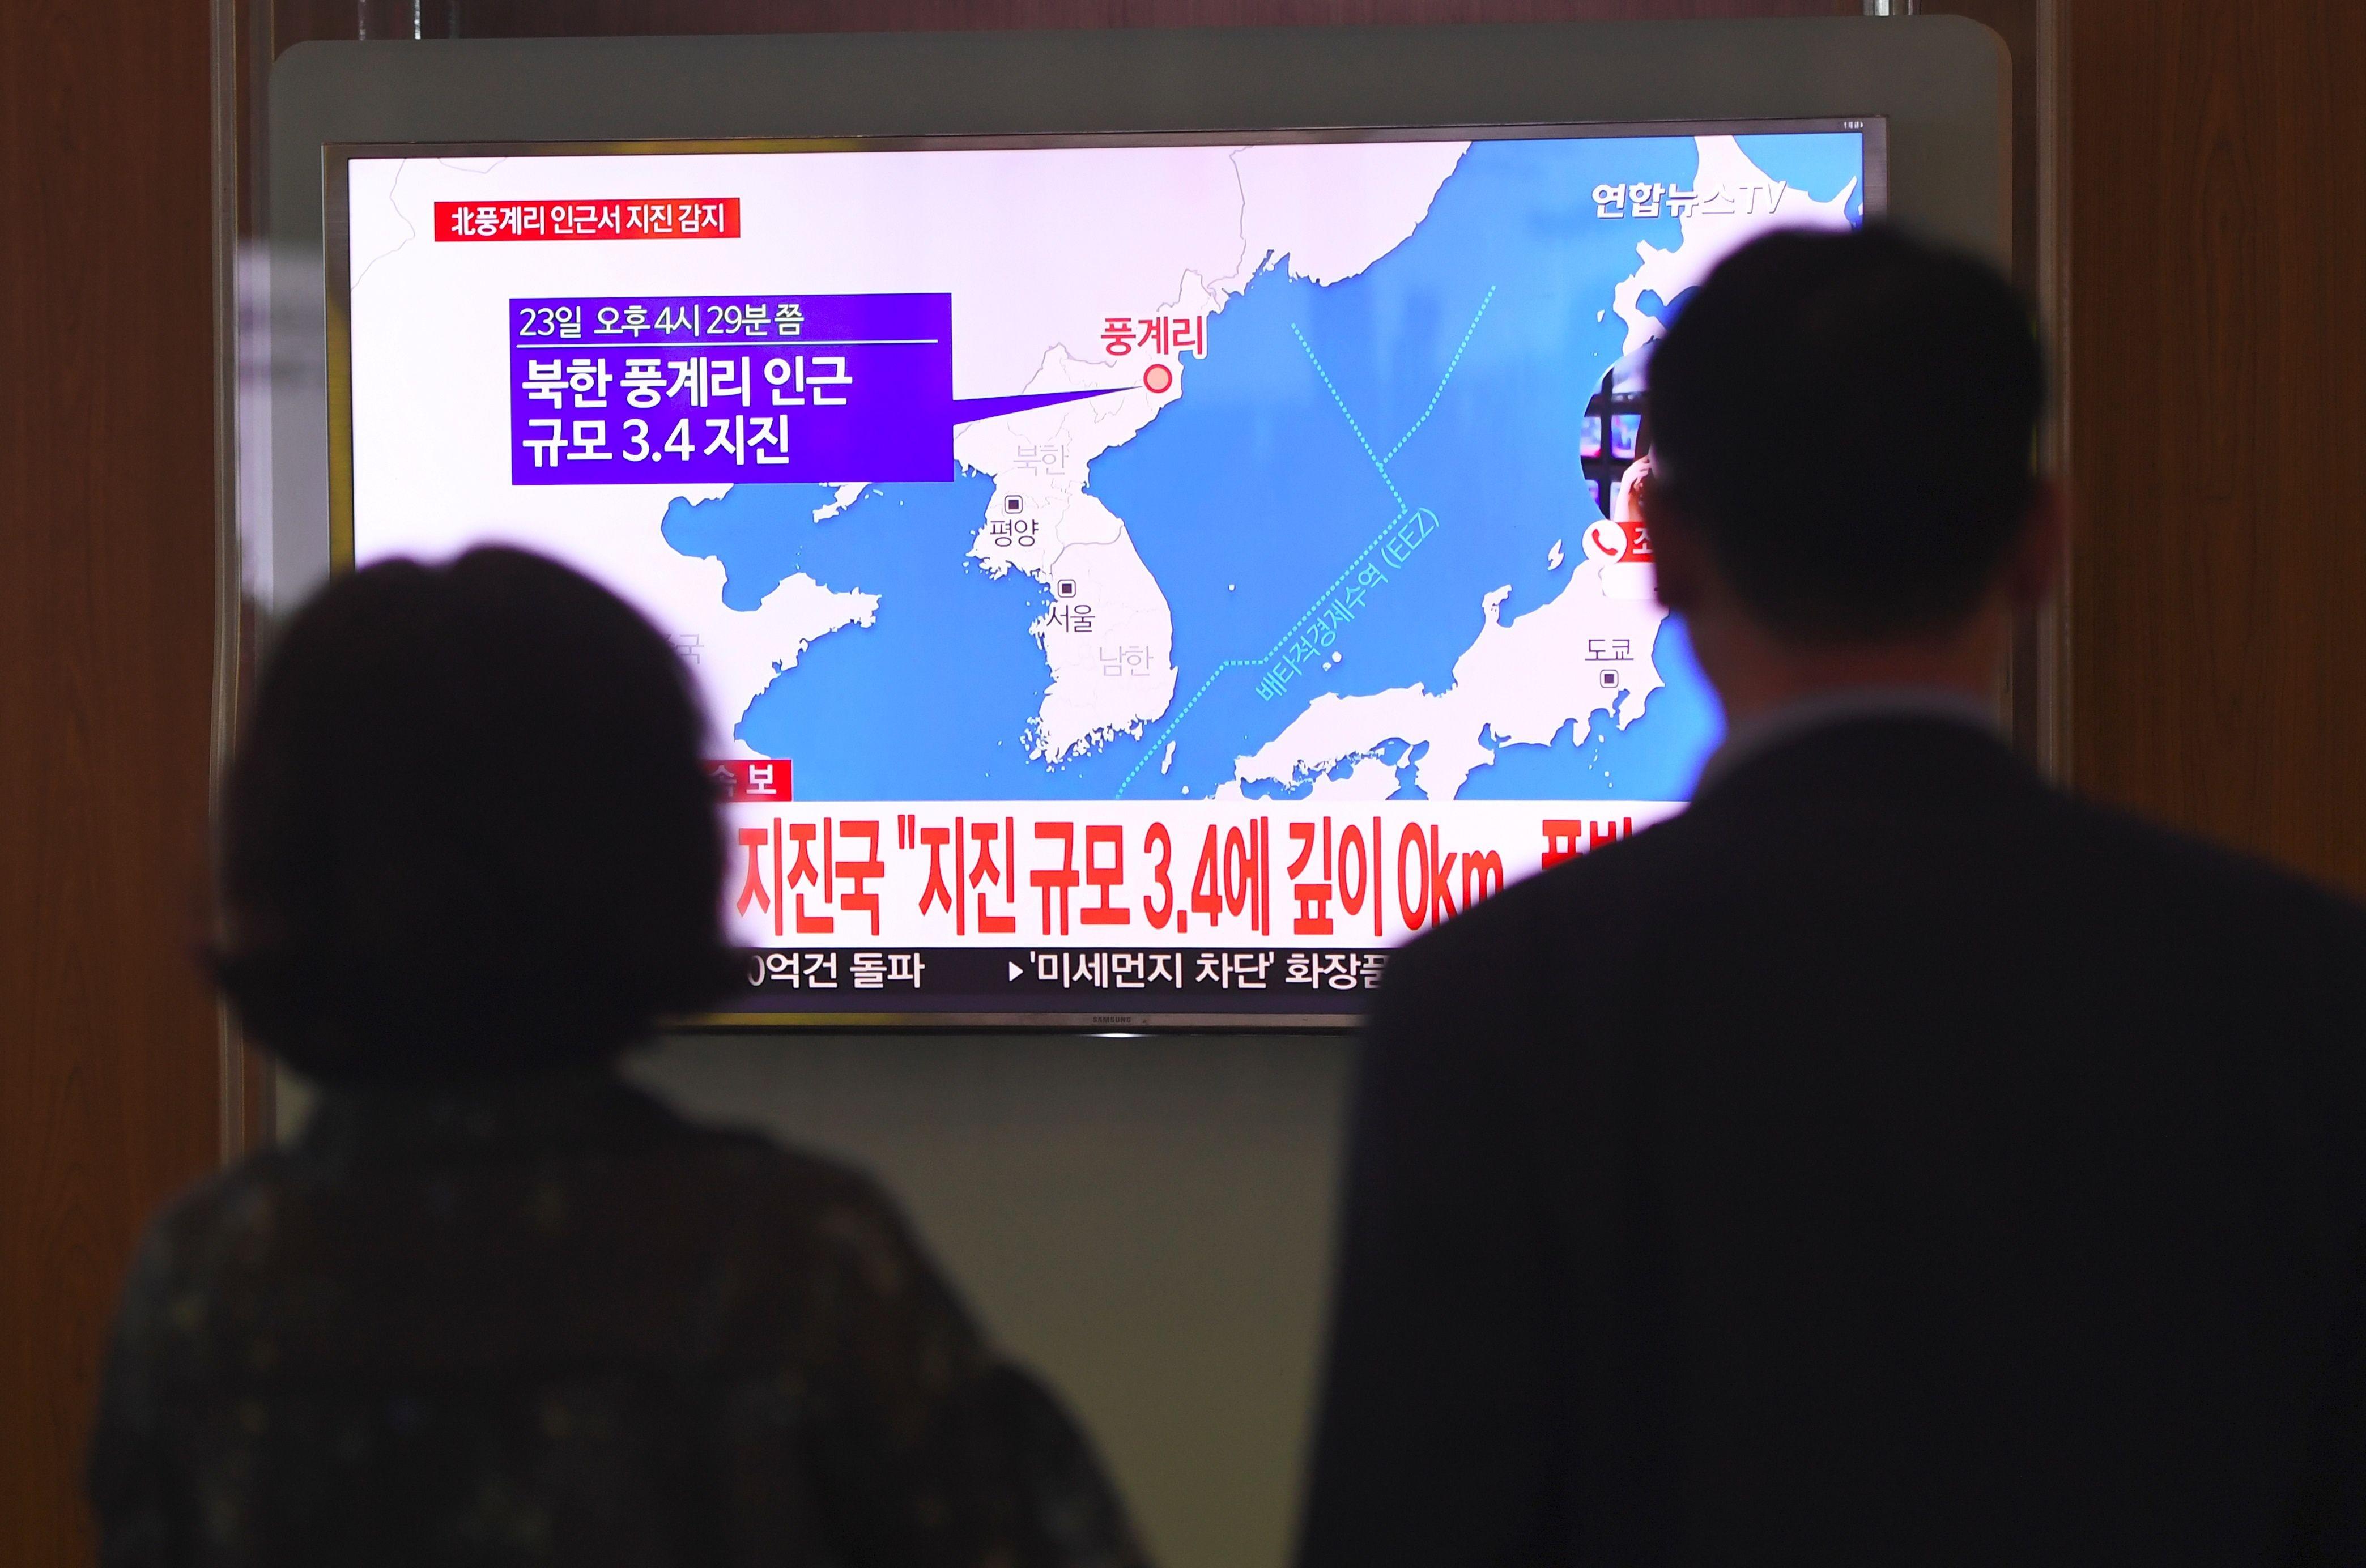 No sound wave, 'it was natural': Chinese, South Korean monitors